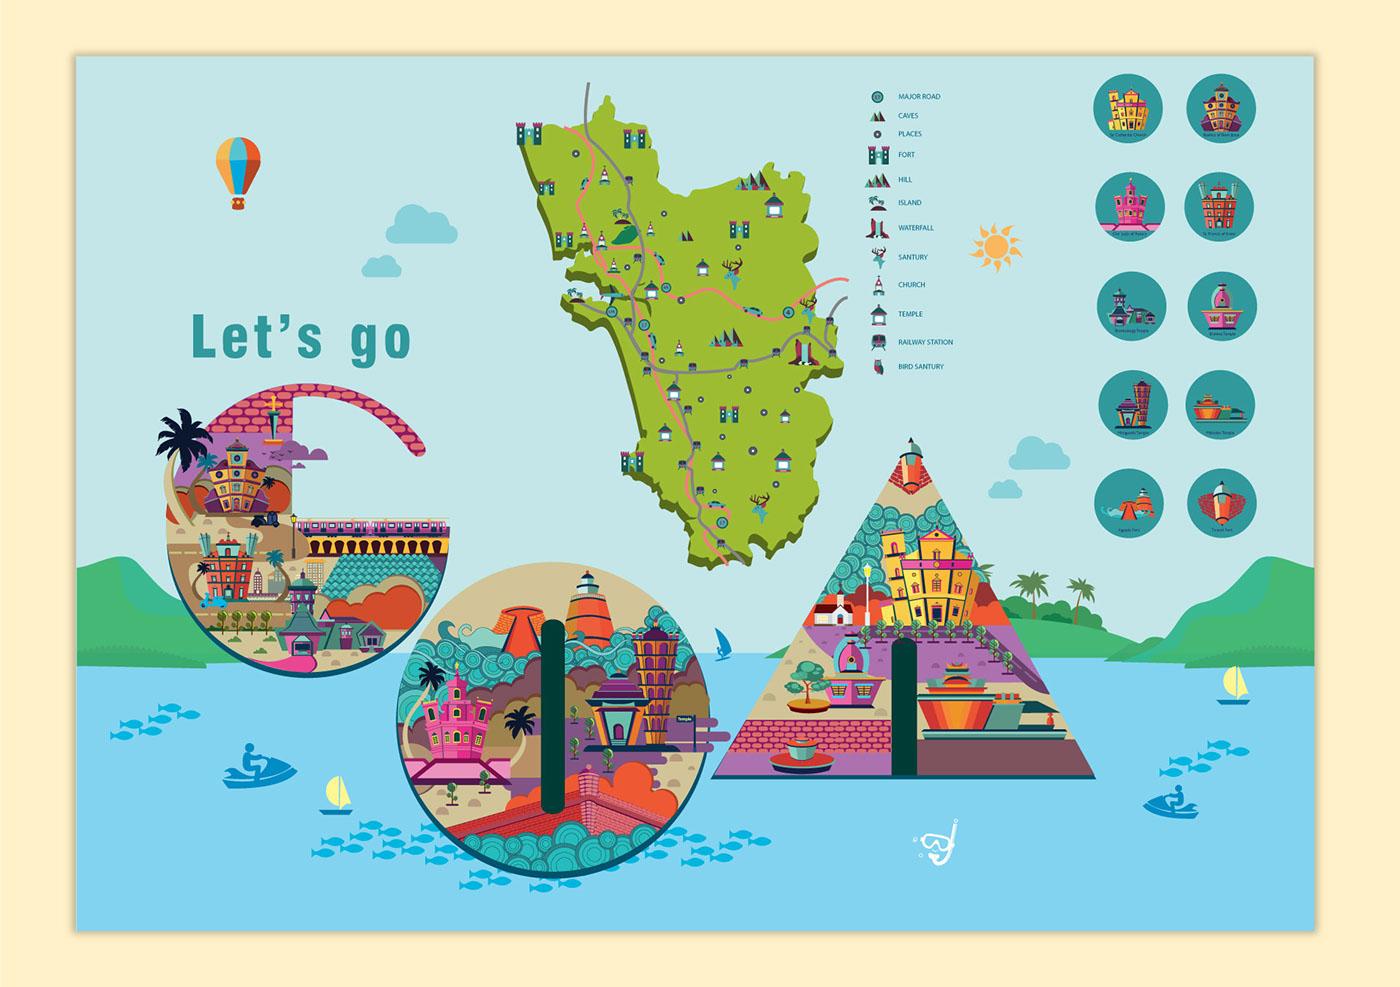 digital illustration art goa tourism by priya shinde